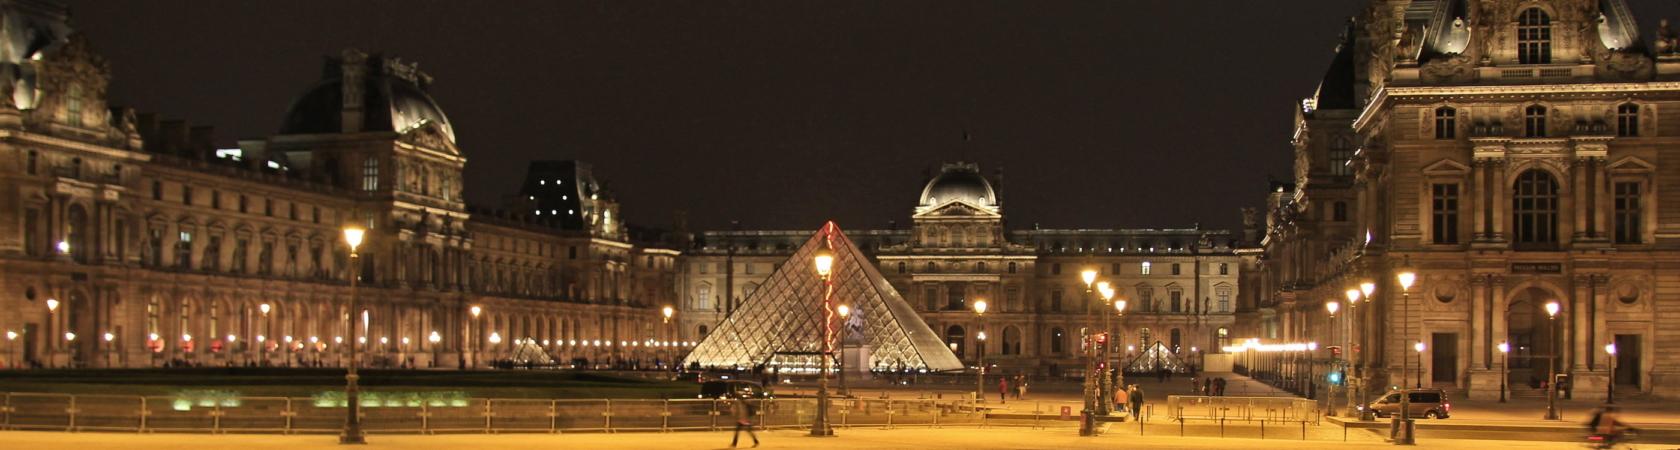 Paris Louvre bei Nacht